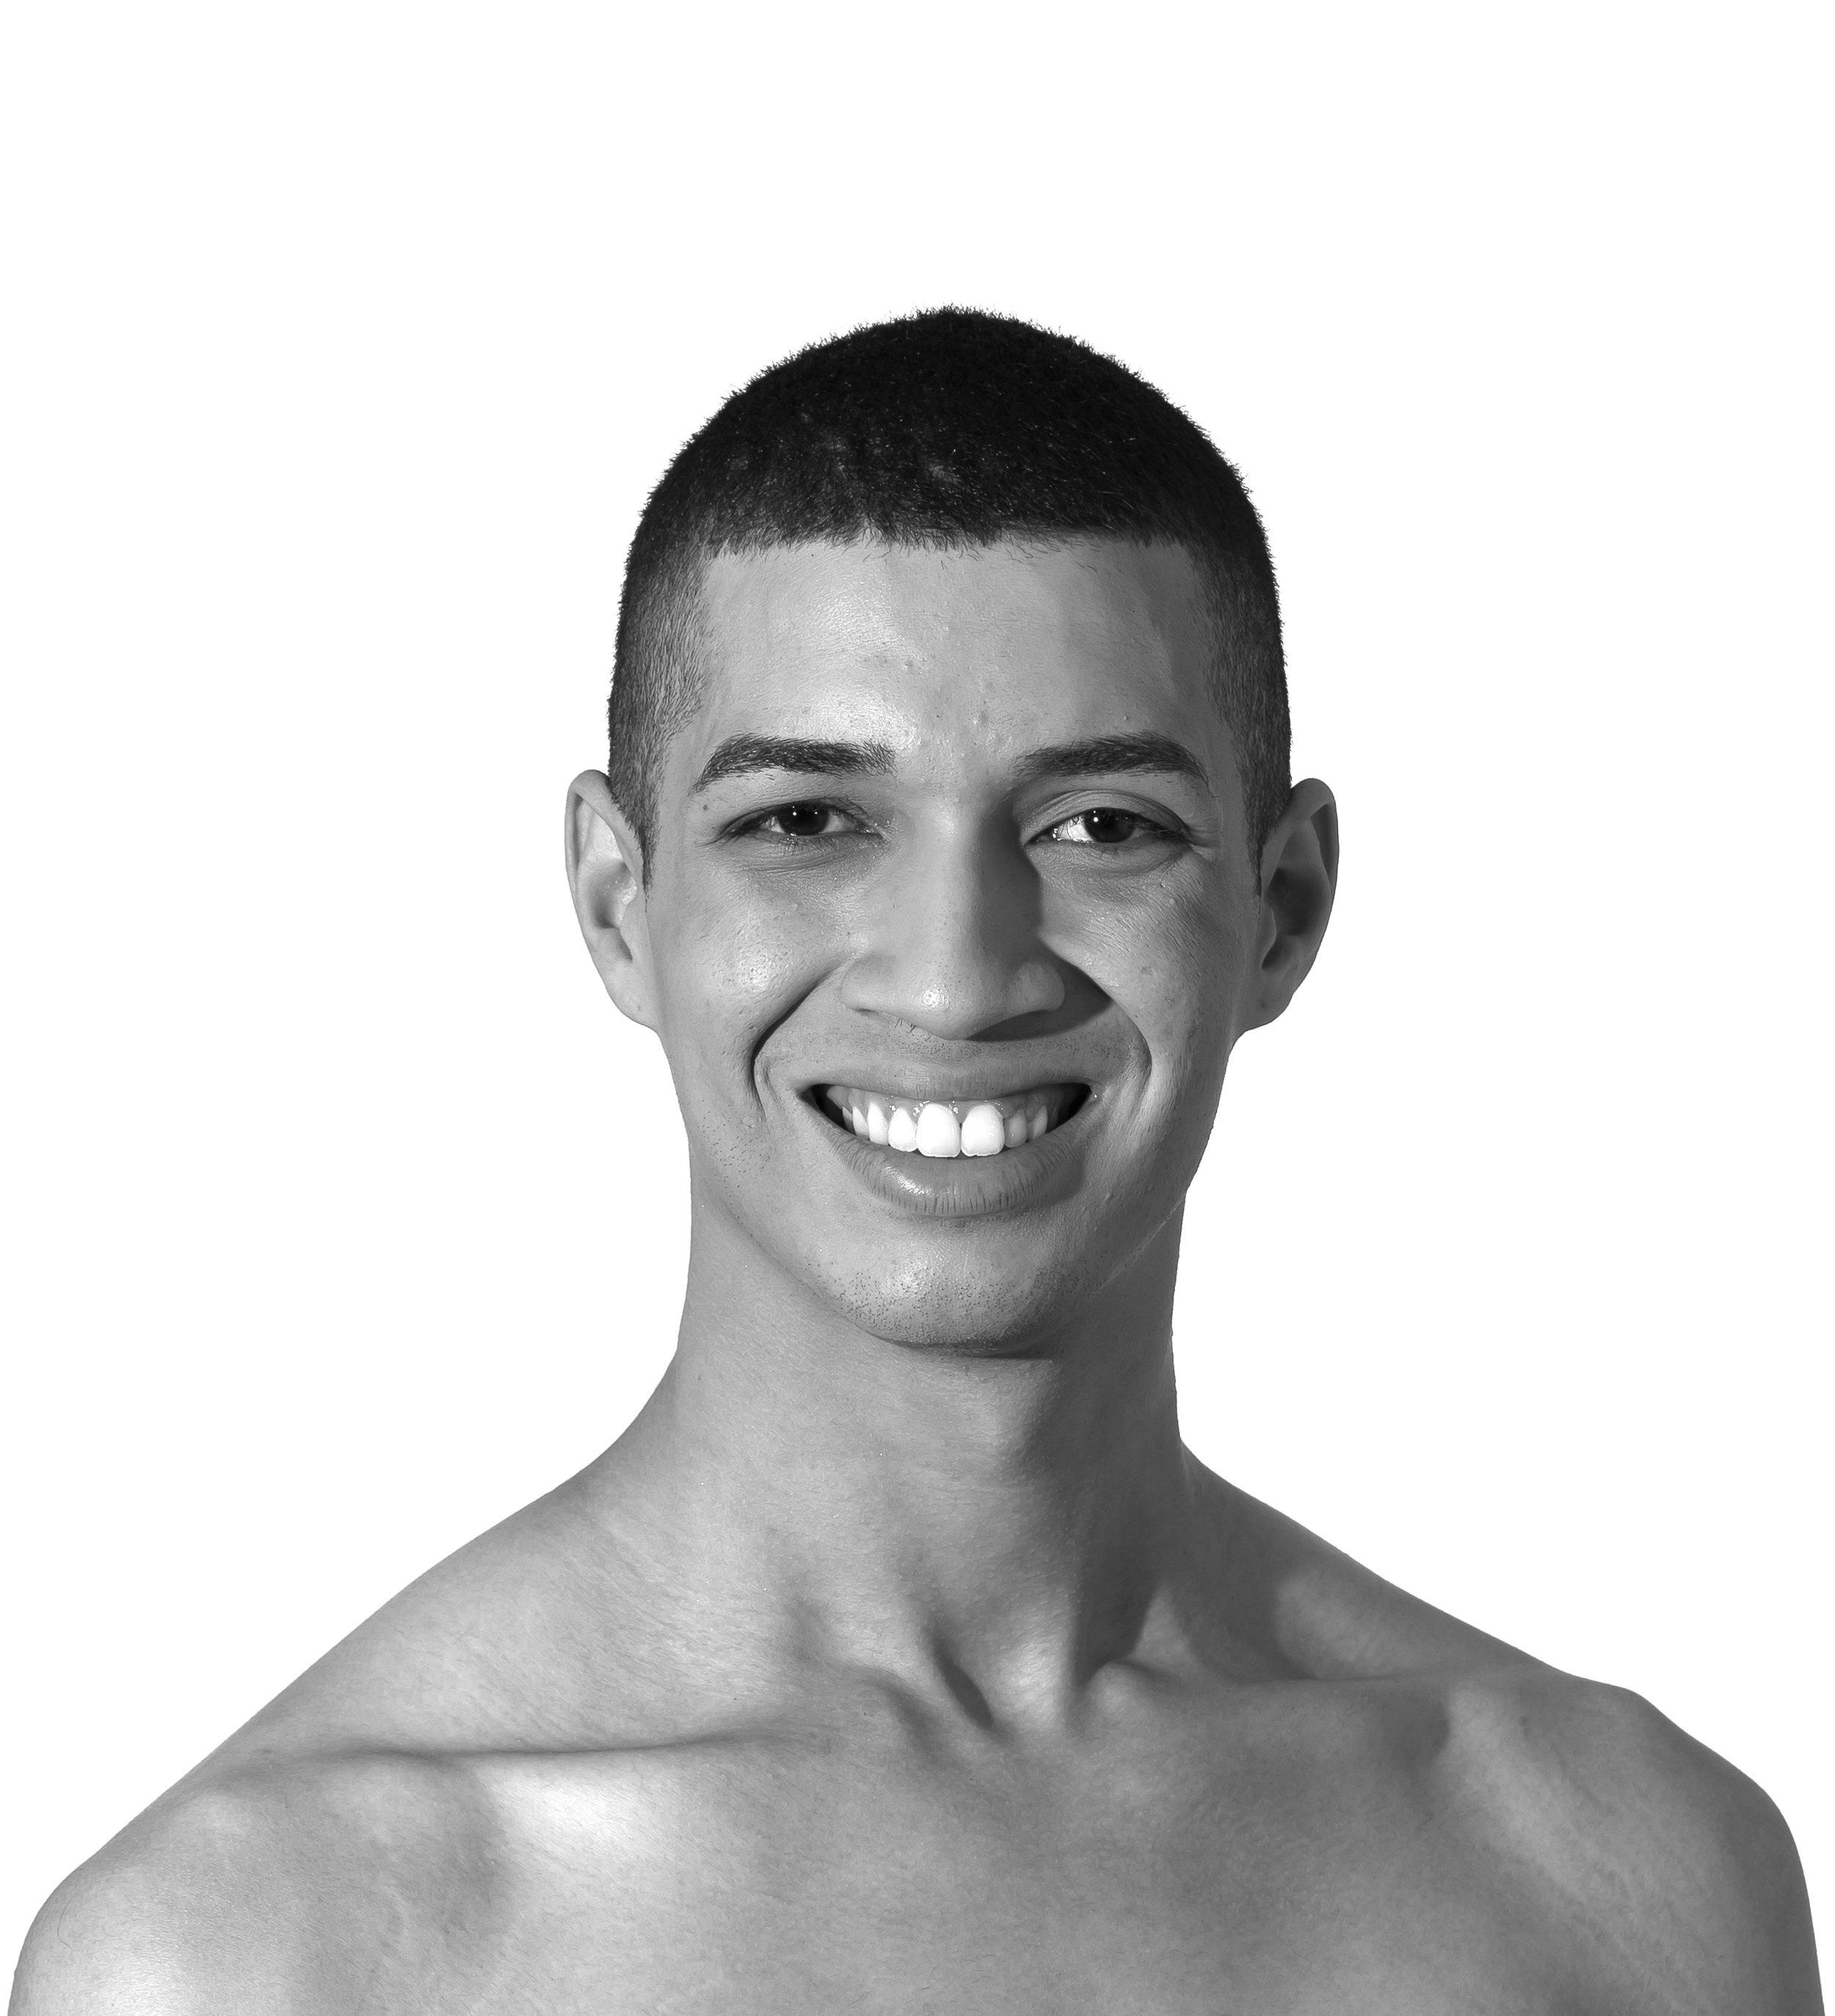 Edgardo Torres